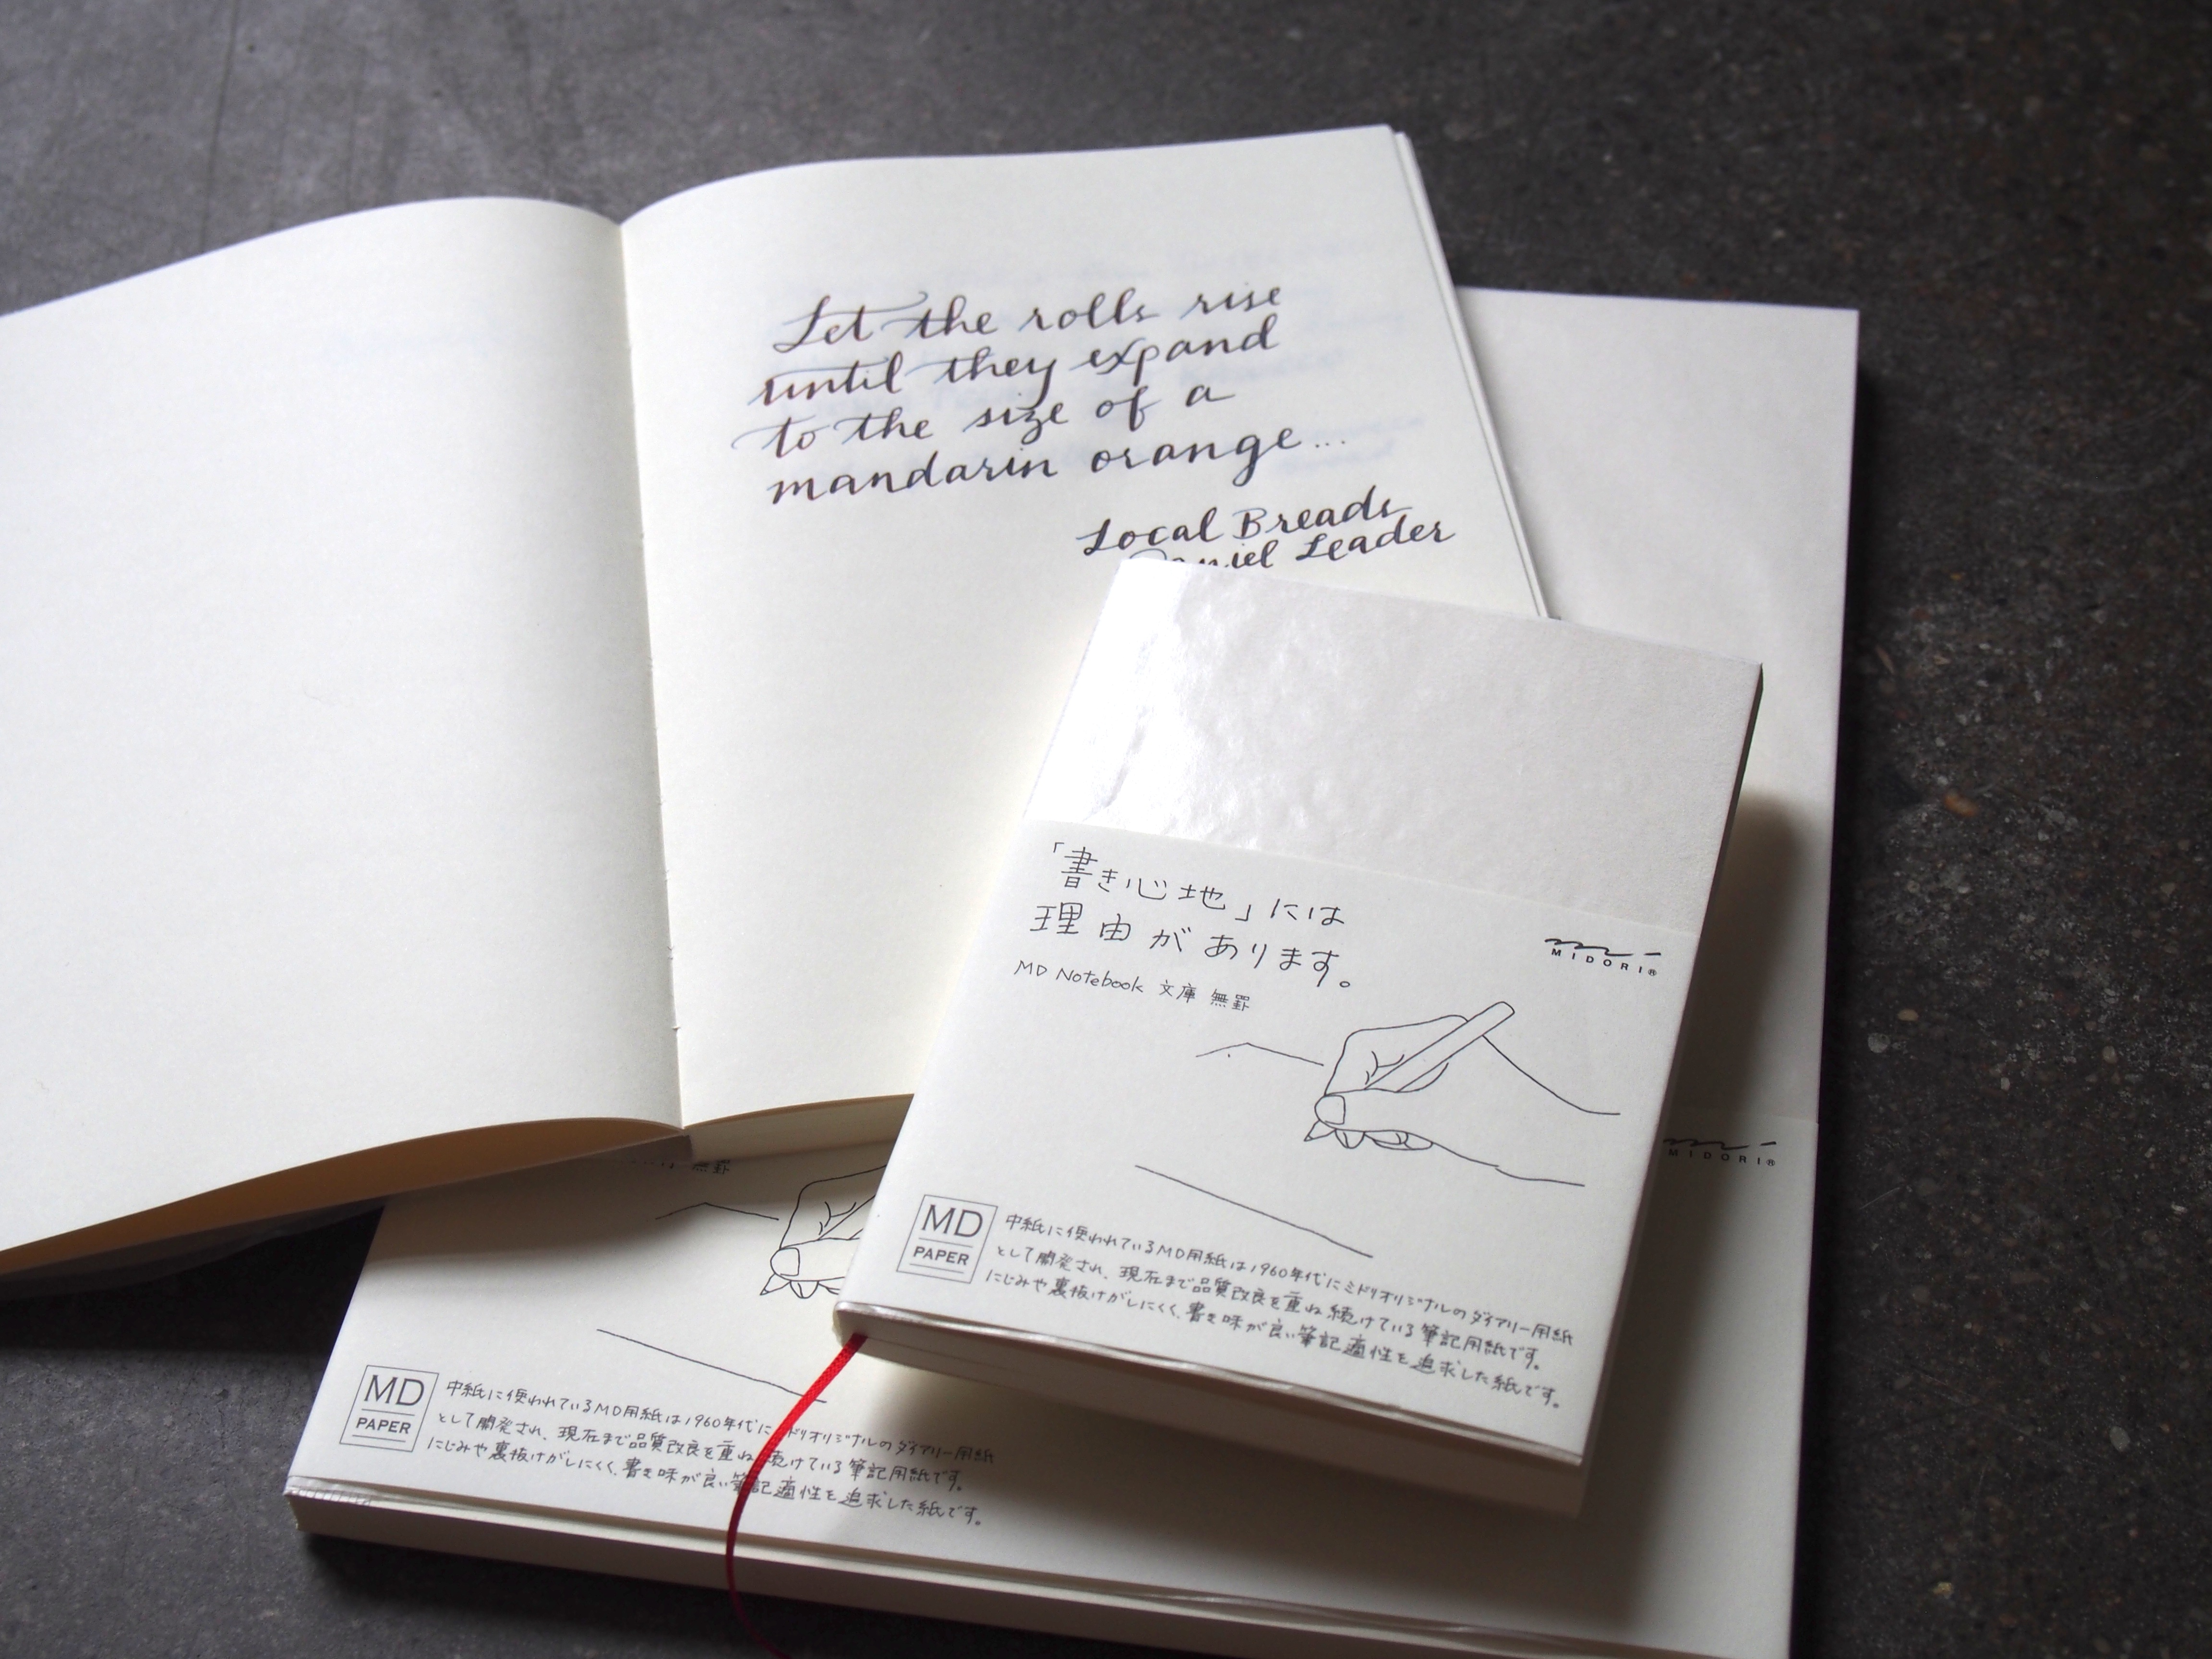 Midori MD Notebook Japan Wonder Pens wonderpens.ca Toronto Canada